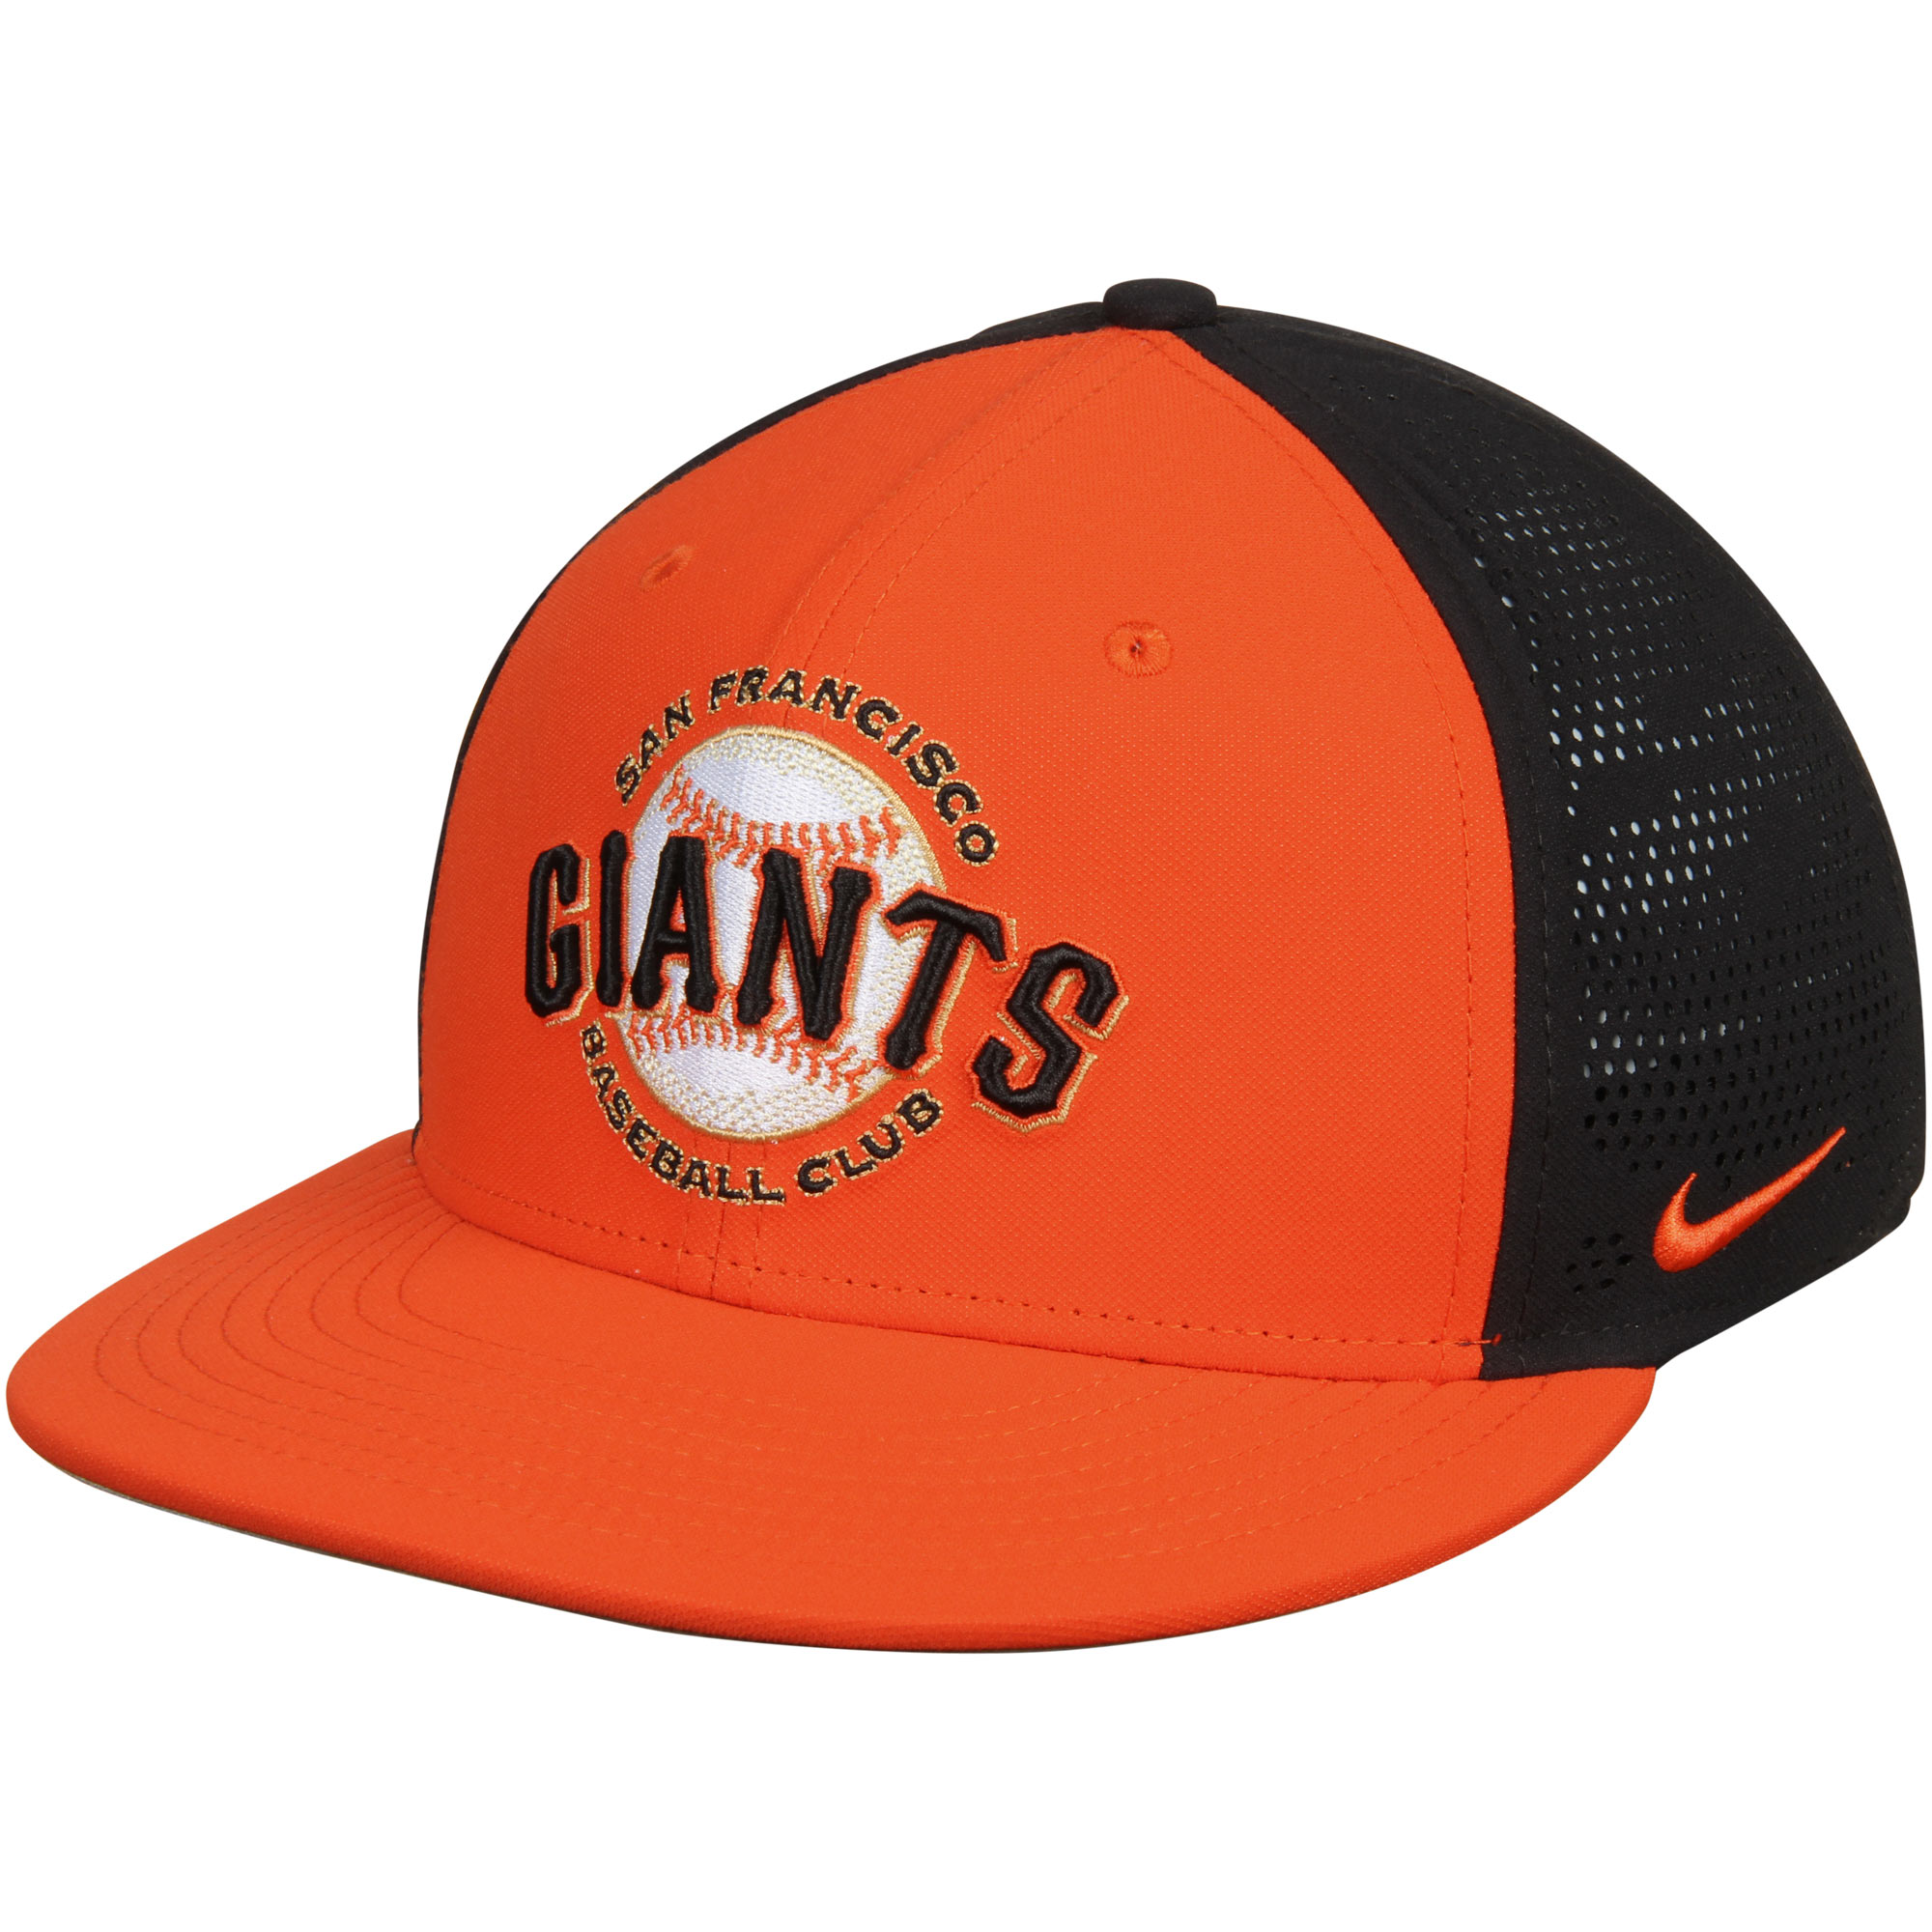 9eaf6a8456875 San Francisco Giants Nike True Vapor Swoosh Performance Flex Hat - Orange  Black - Walmart.com